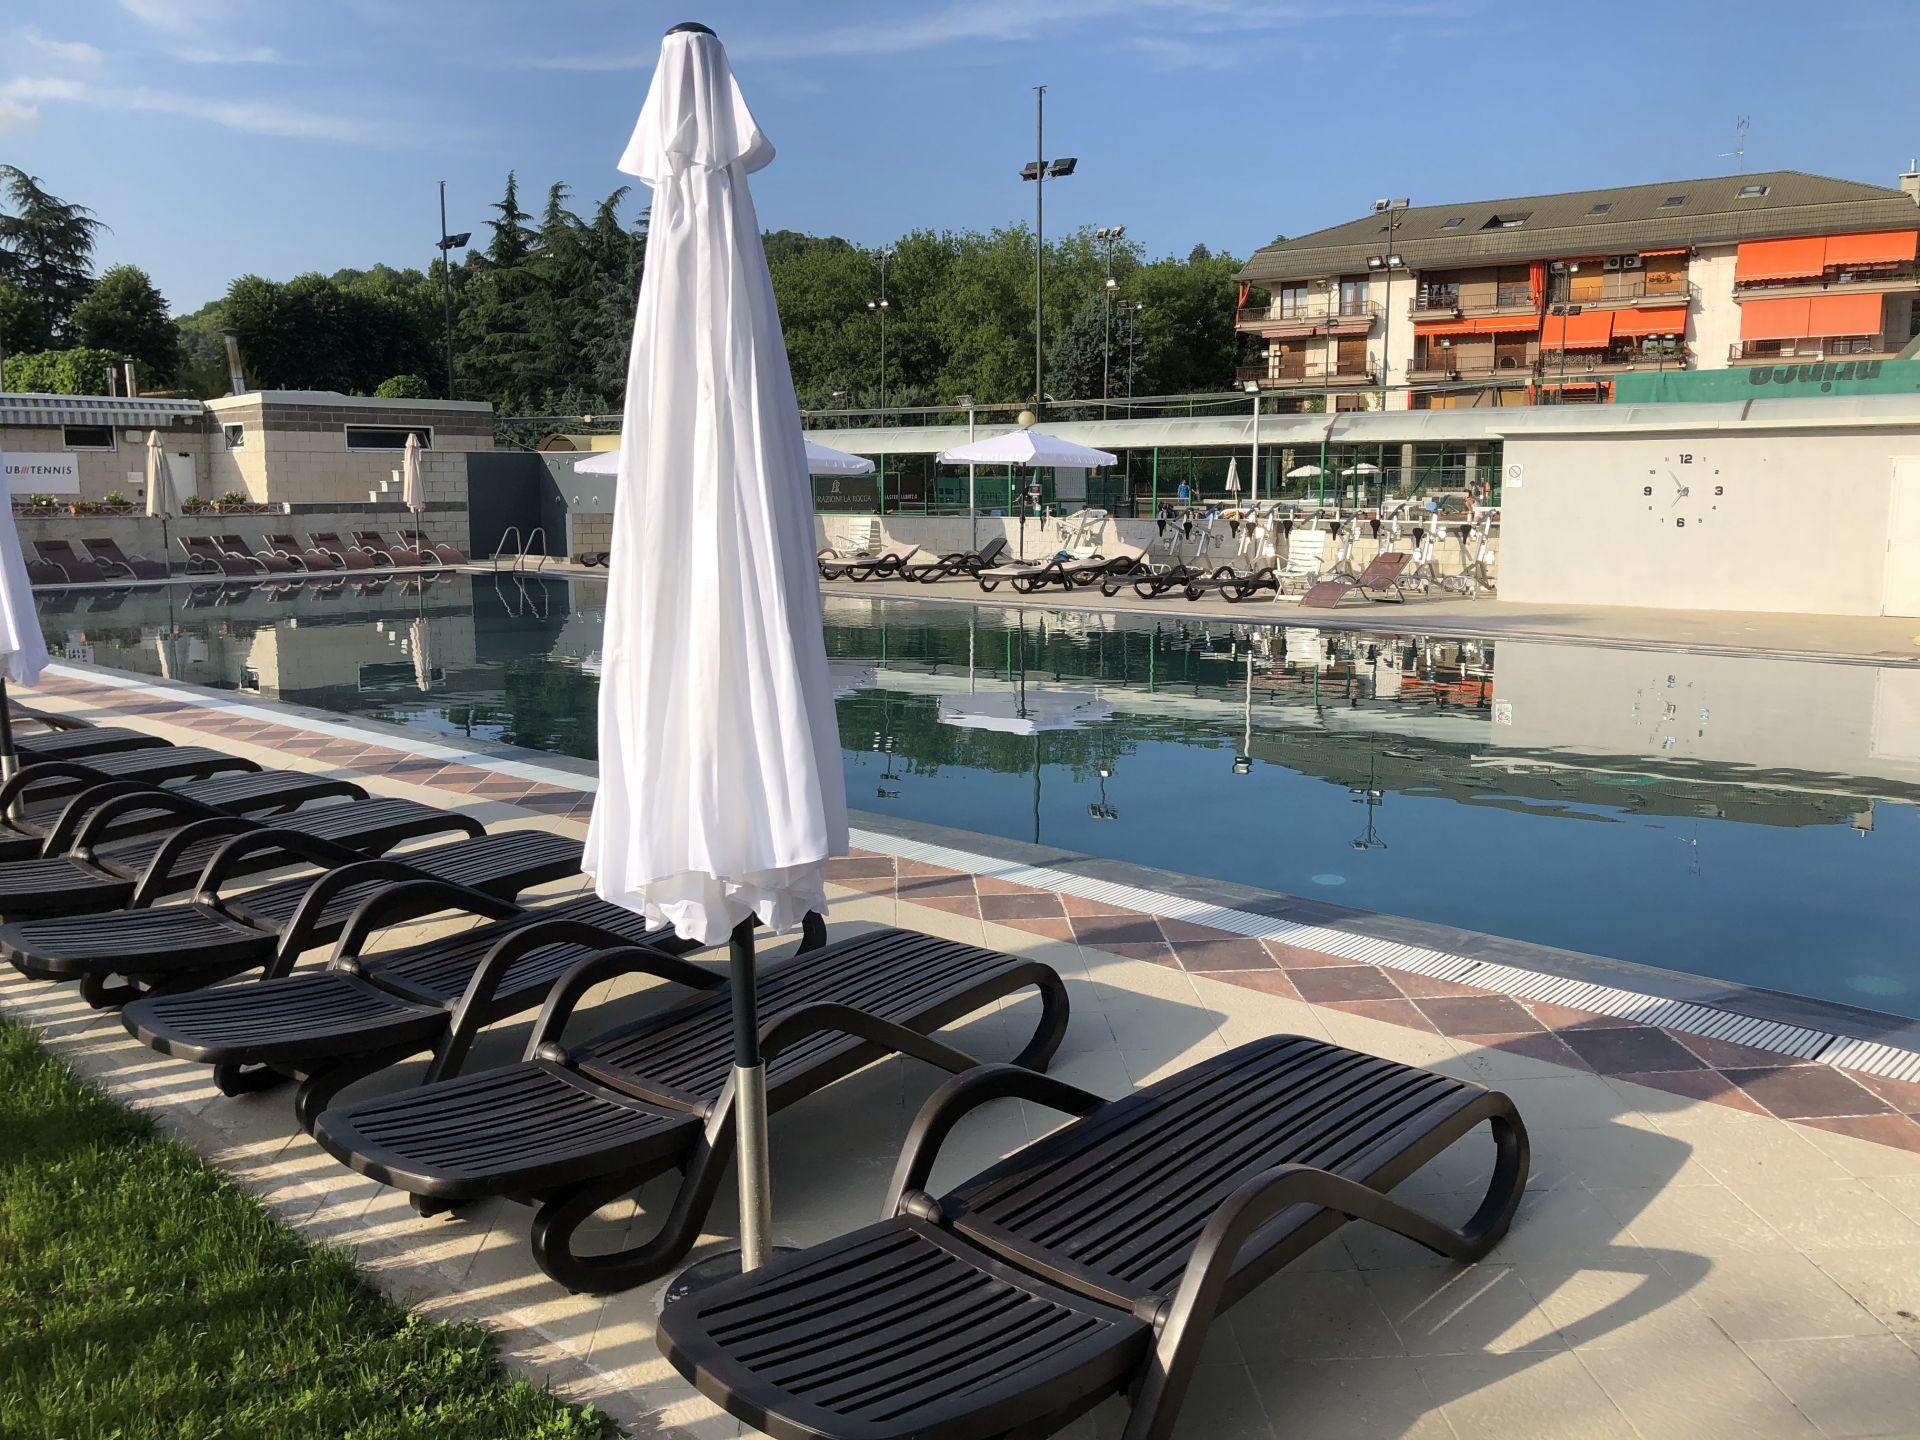 Piscina all 39 aperto a torino moncalieri - Palestre con piscina torino ...